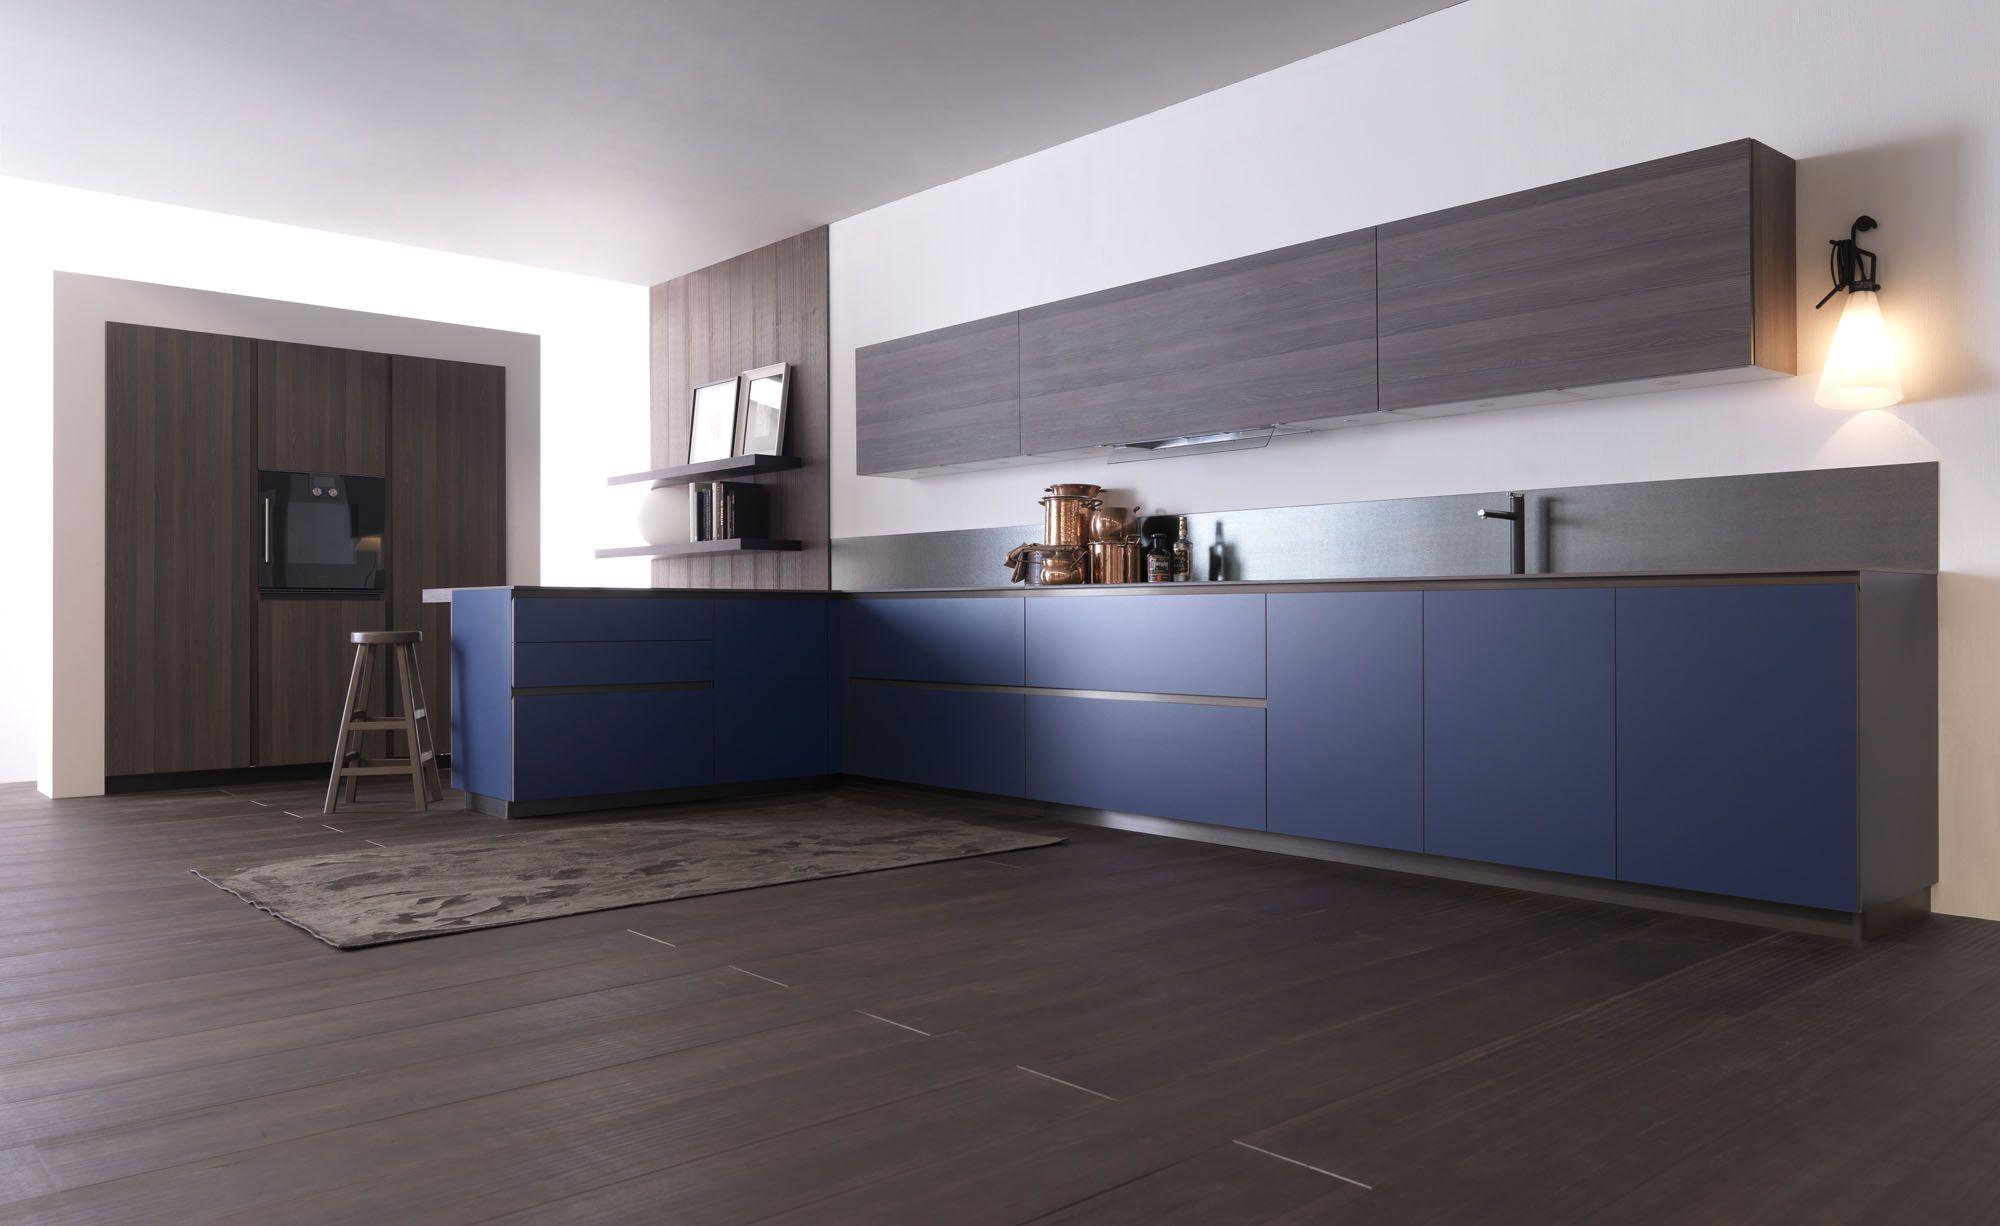 Cucine Effeti: Cucine Moderne, Cucine di Design Italiane | Cuisine ...